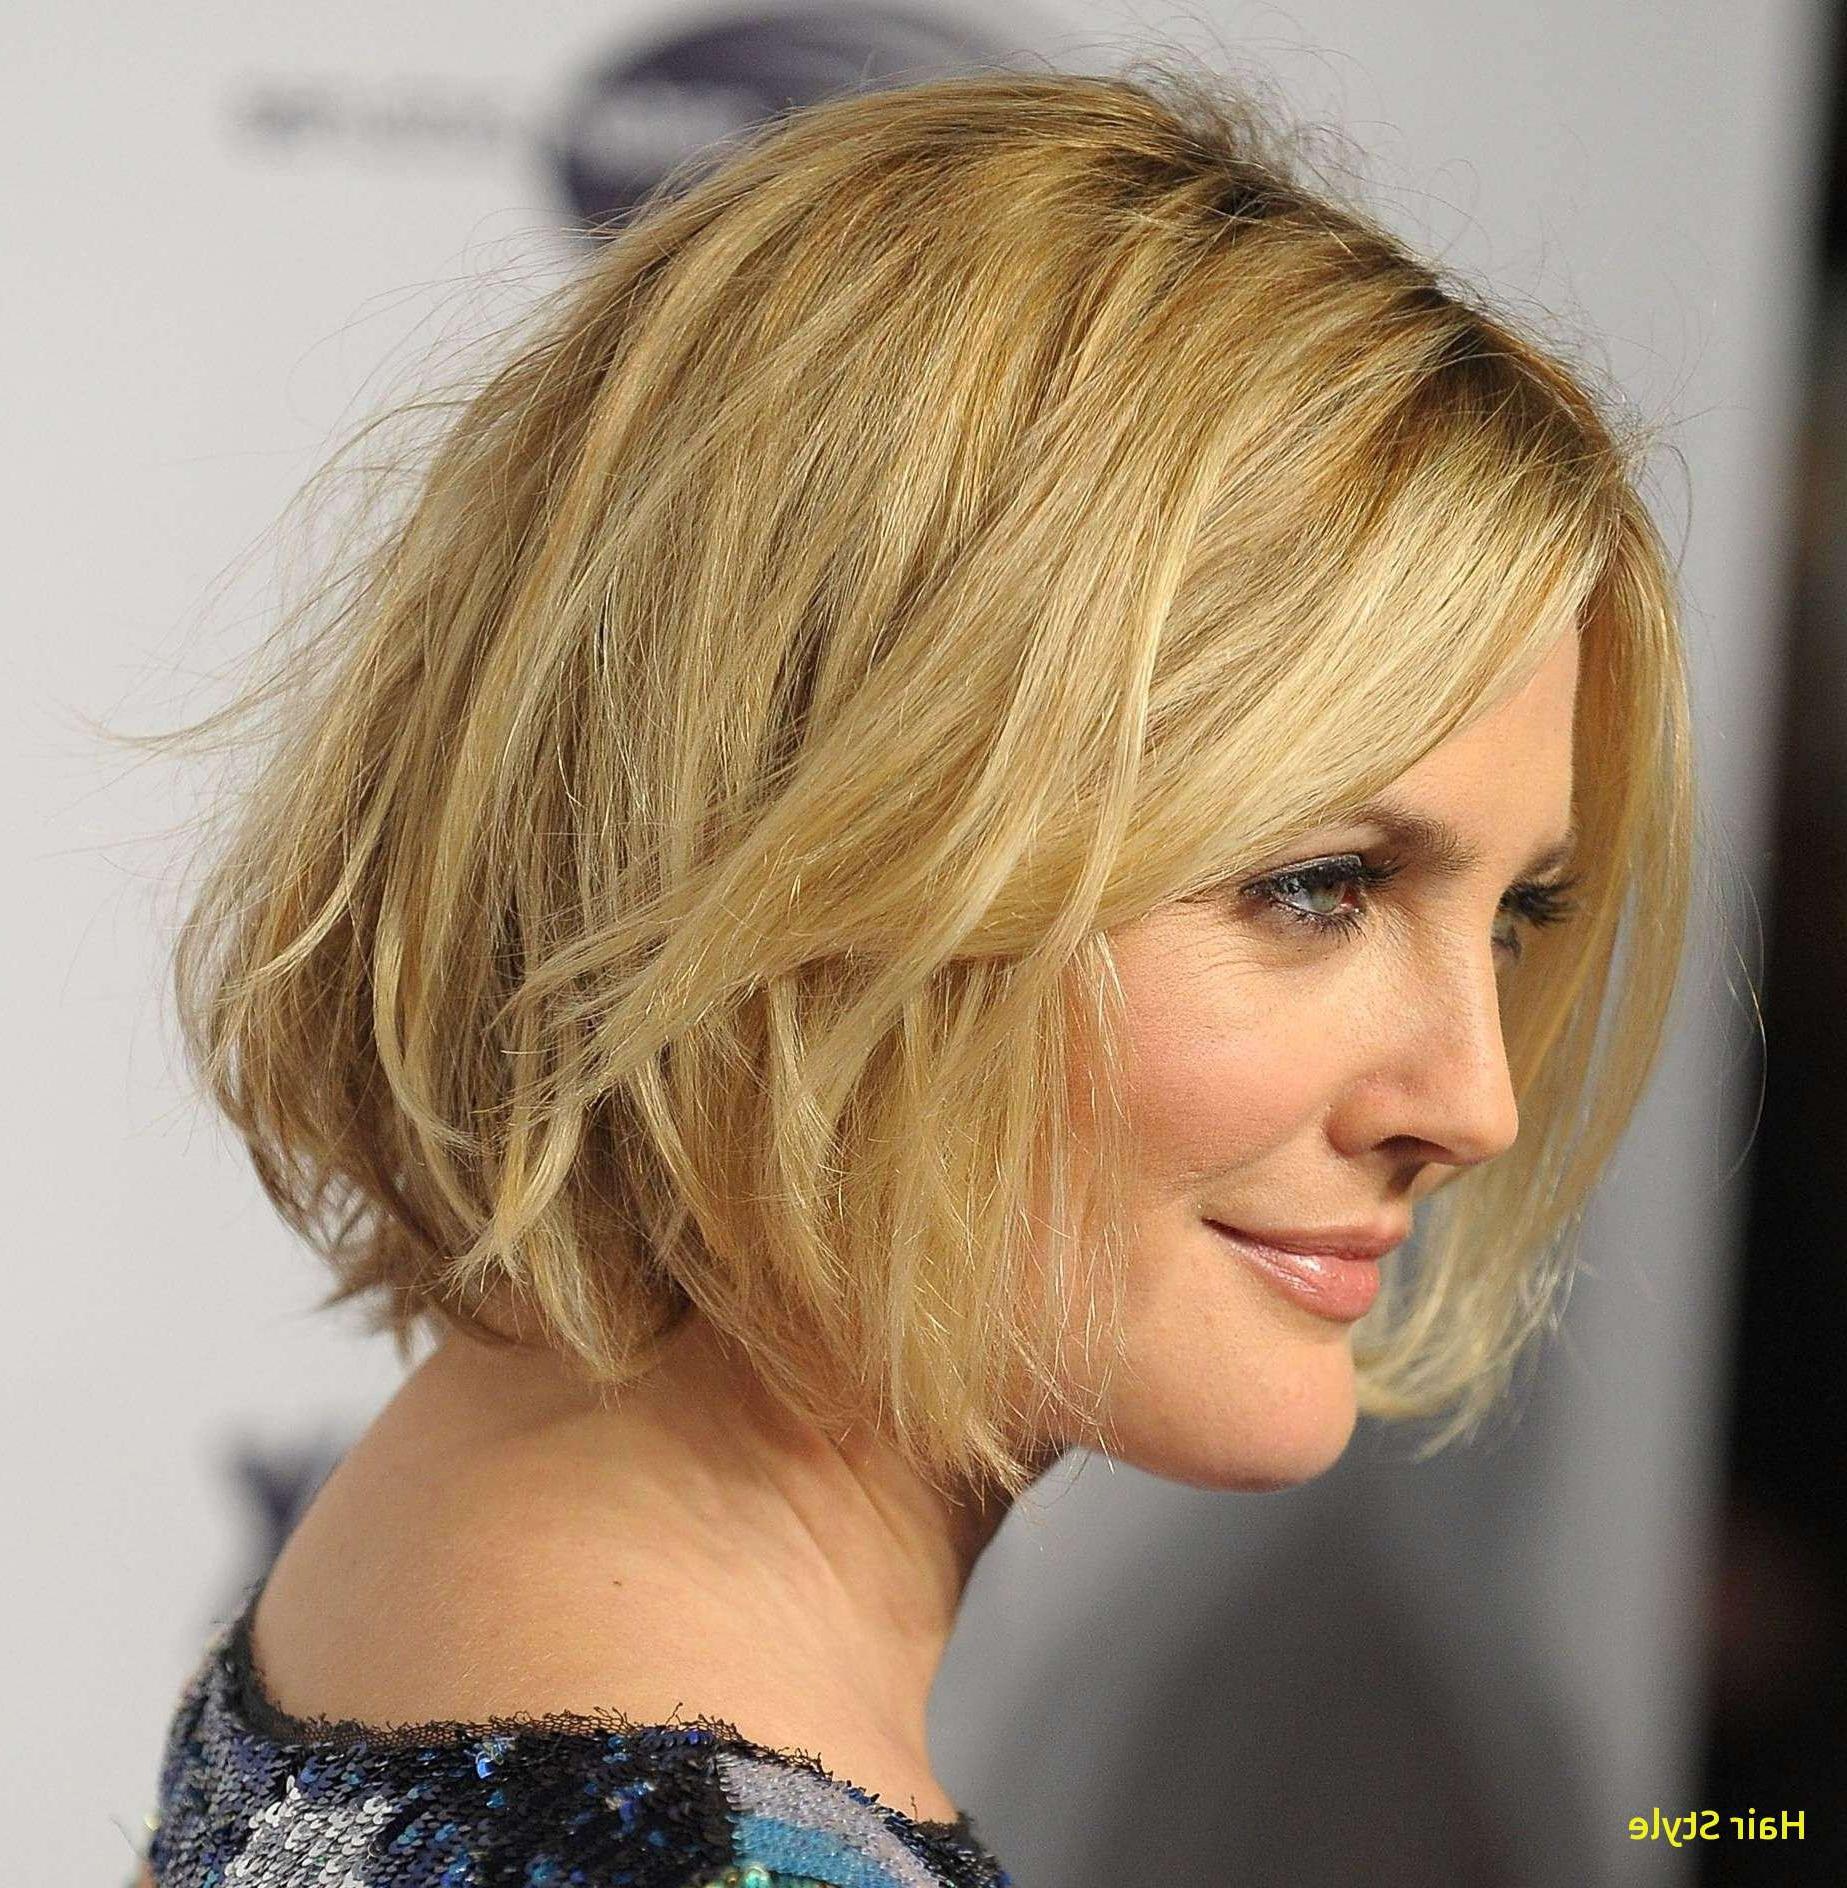 Drew Barrymore Short Hairstyles New Fresh Short Bob Hairstyles 2016 for Drew Barrymore Short Hairstyles